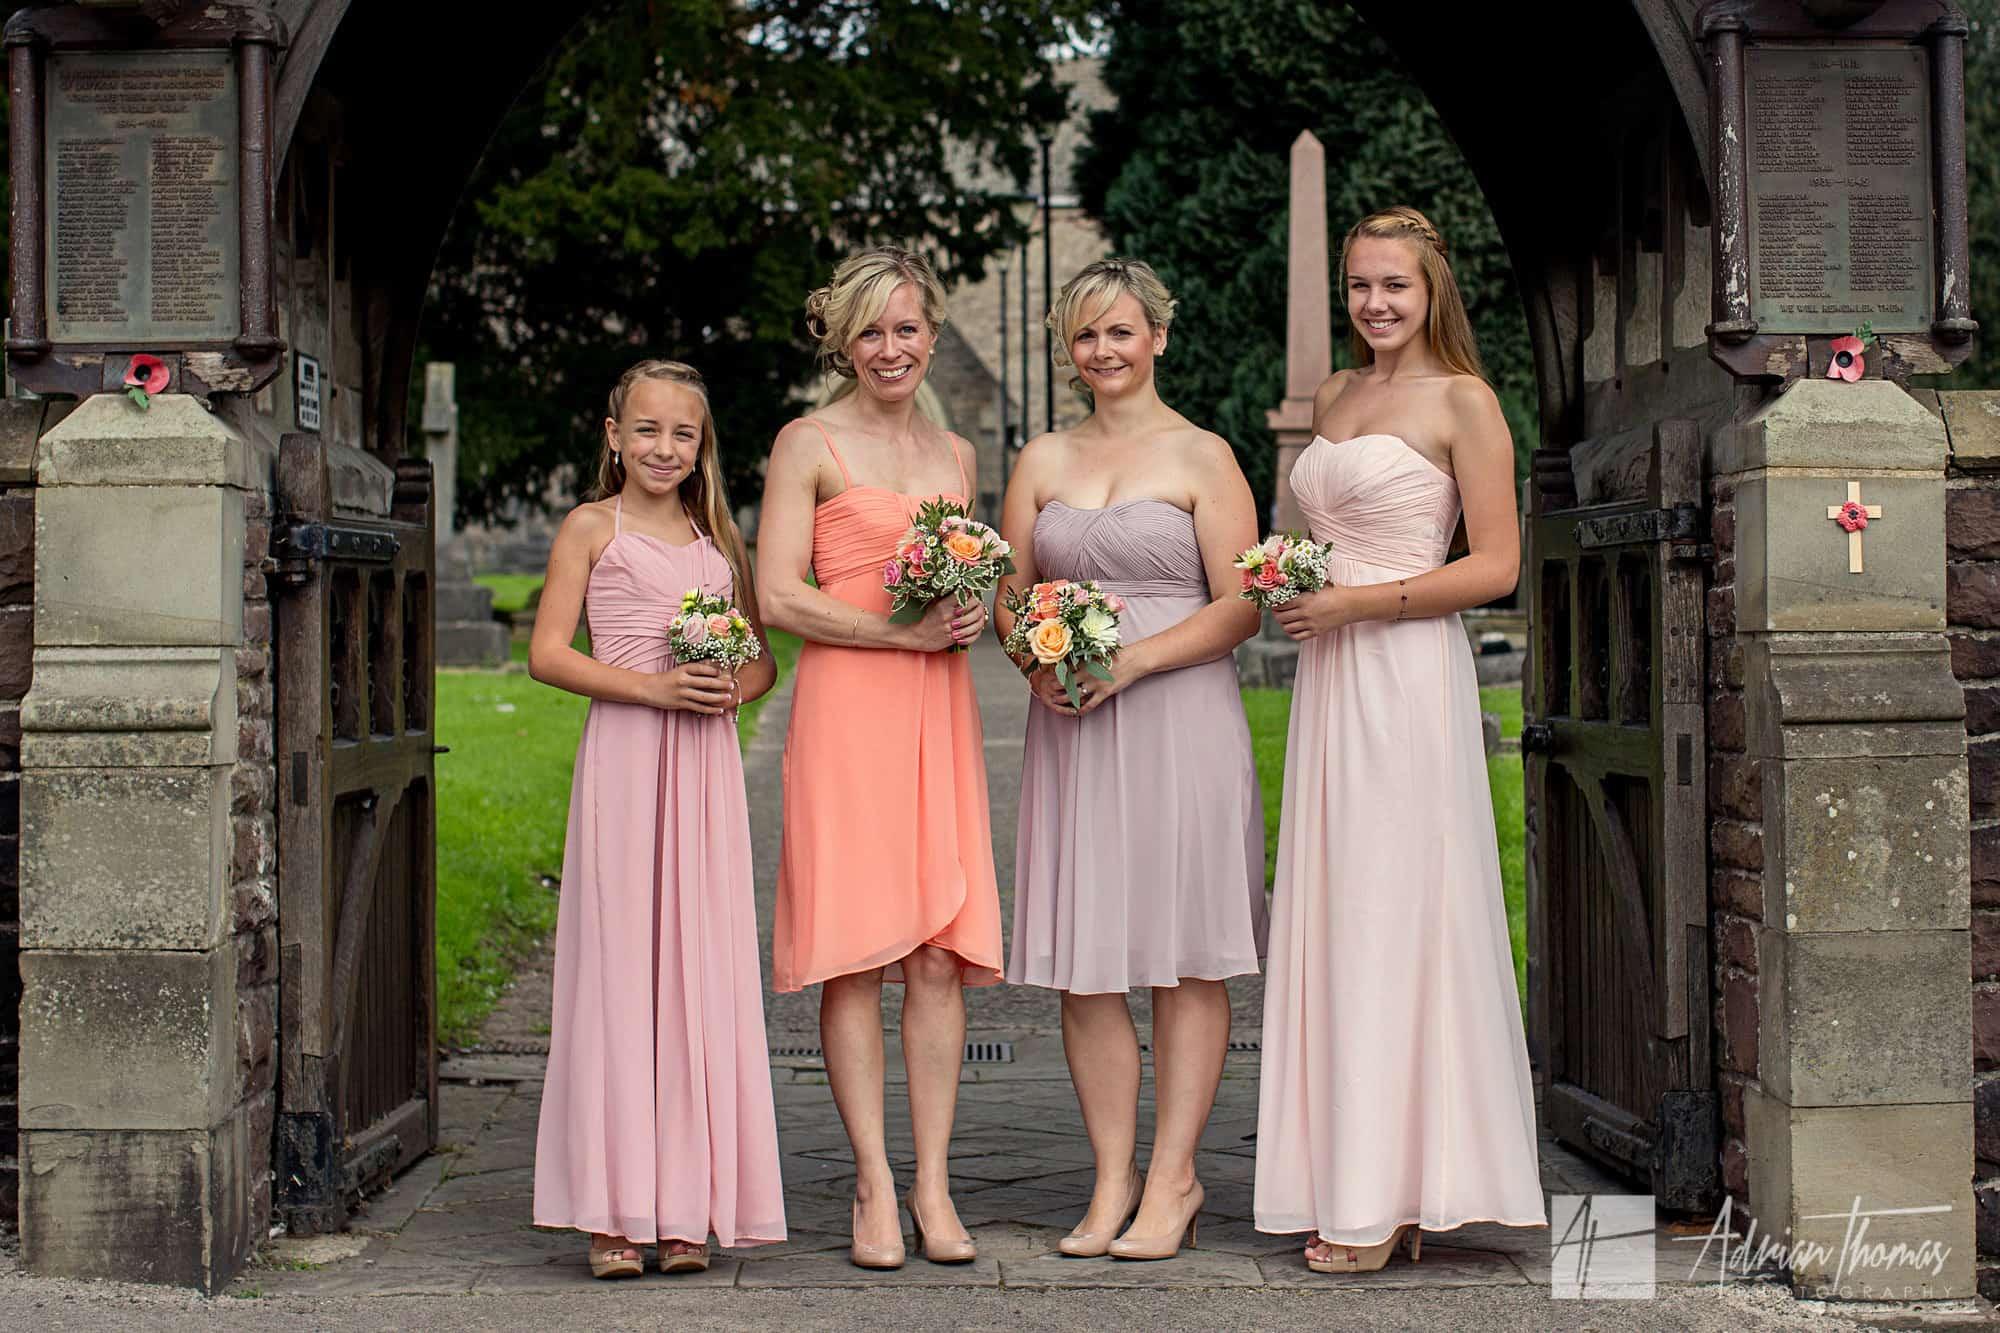 Bridesmaids outside St Basils Church in Bassaleg near Caerphilly.